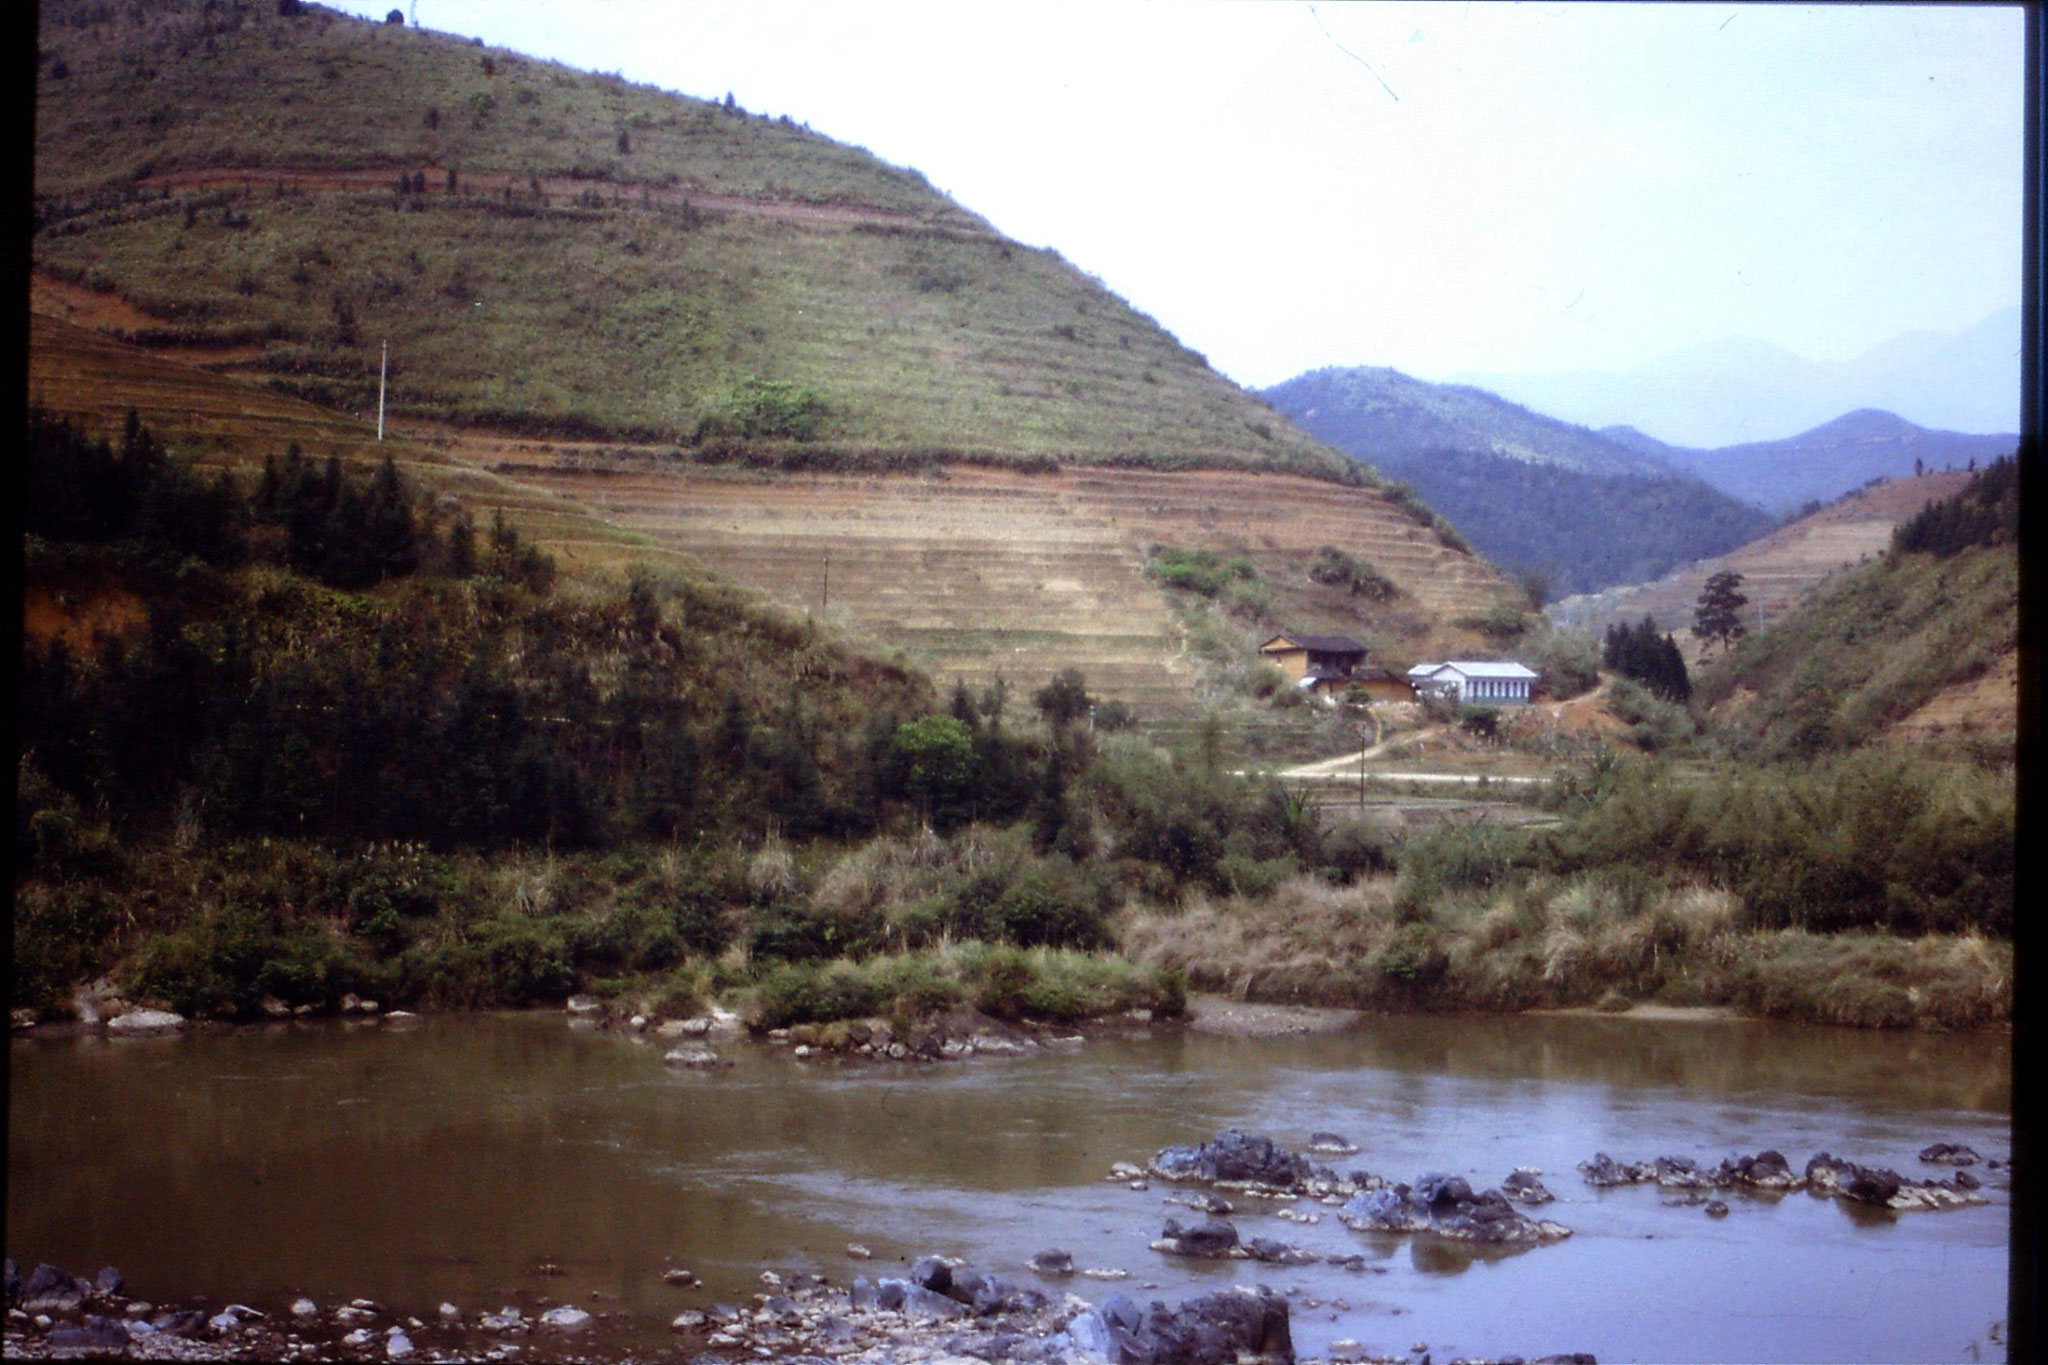 29/3/1989: 9: Fujian